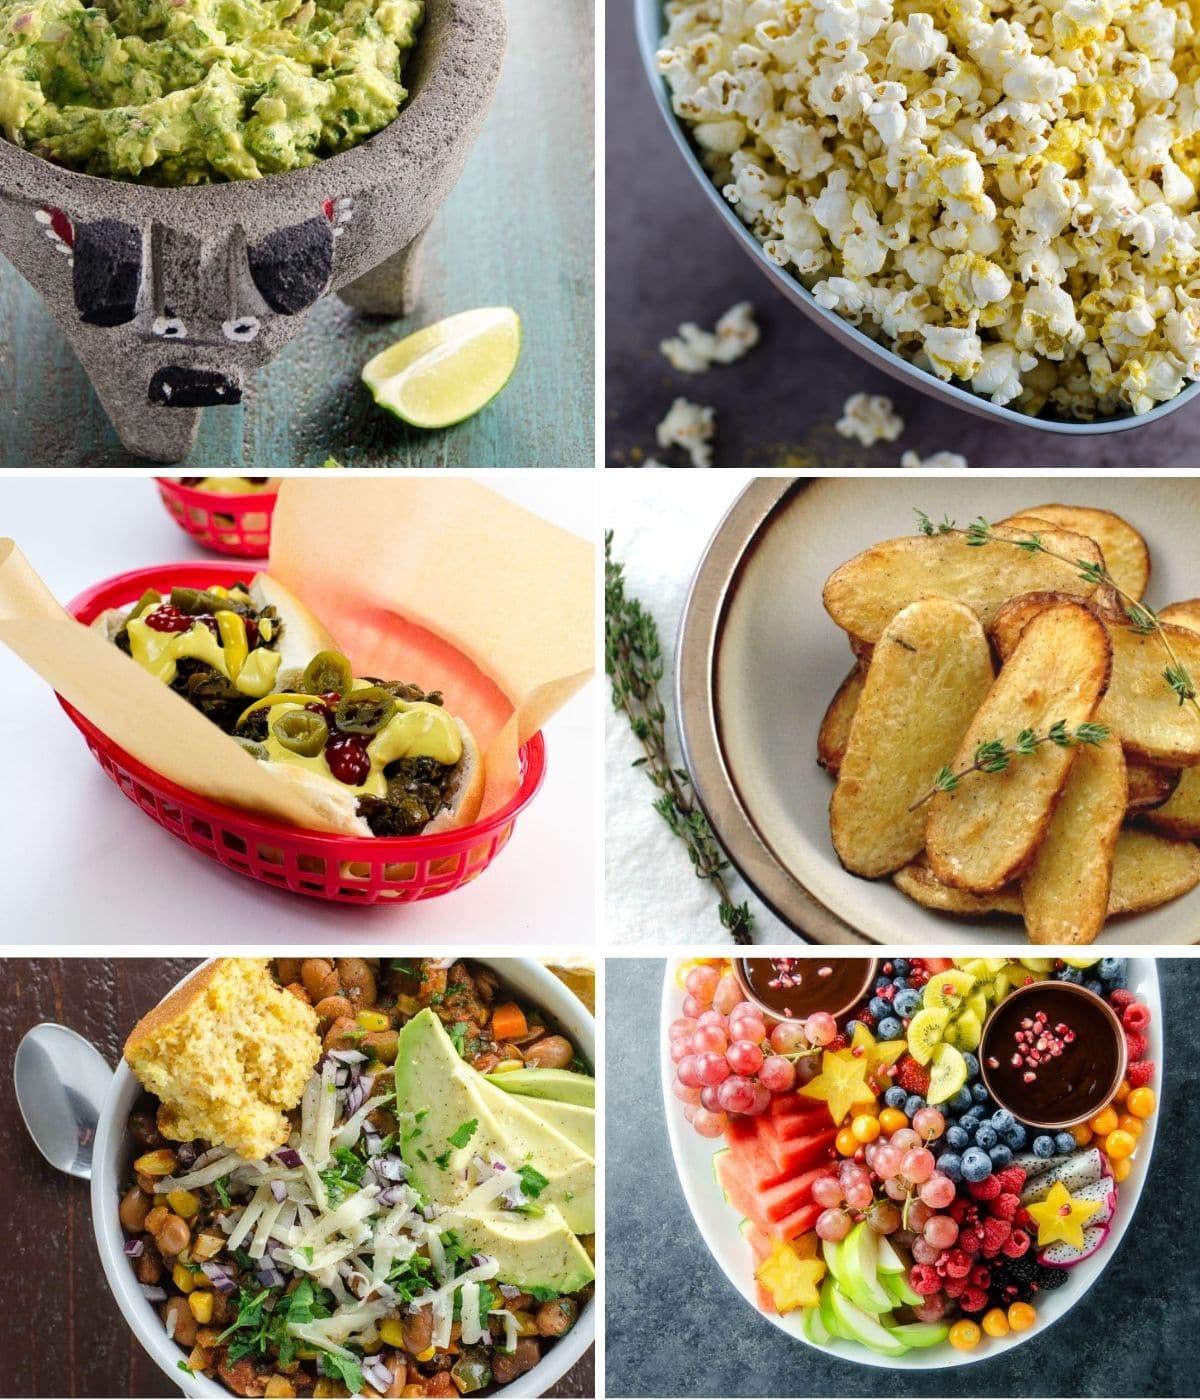 guacamole, popcorn, vegan cheesesteak, salt and vinegar potatoes, vegan chili, and fruit platter